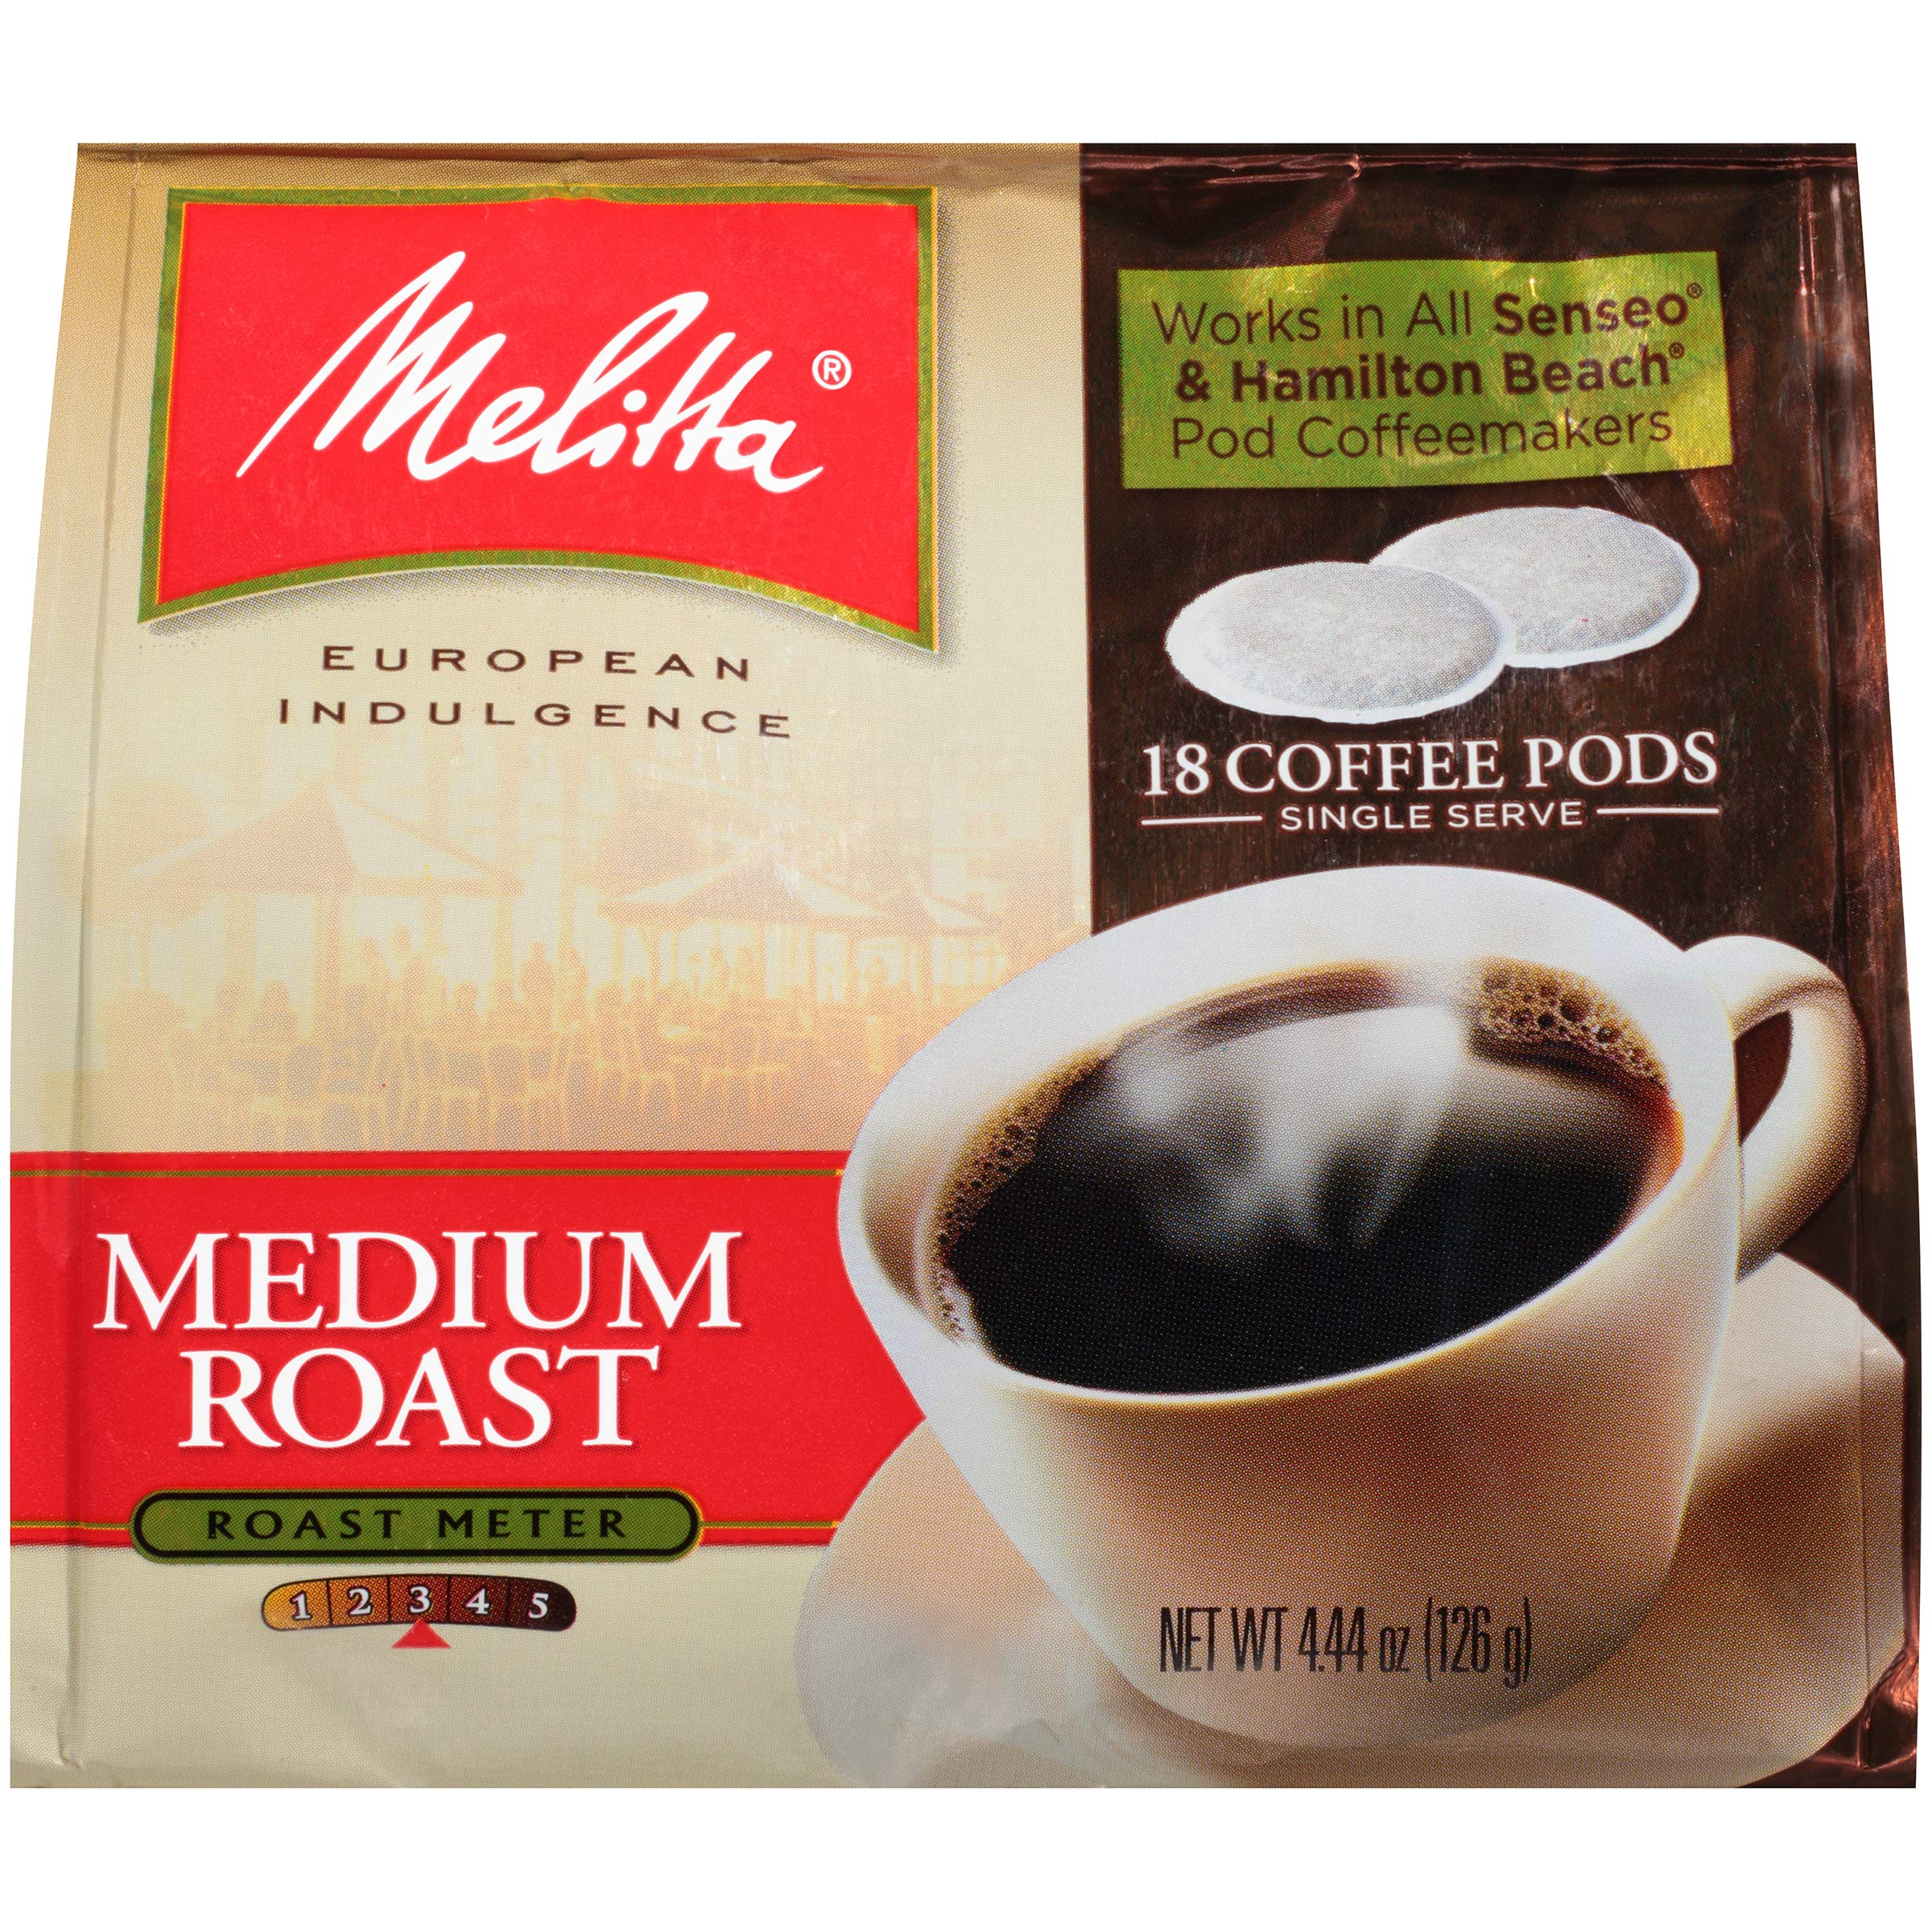 Melitta Medium Roast Coffee Pods for Senseo & Hamilton Beach Pod Brewers, 18 Count (Pack of 6)